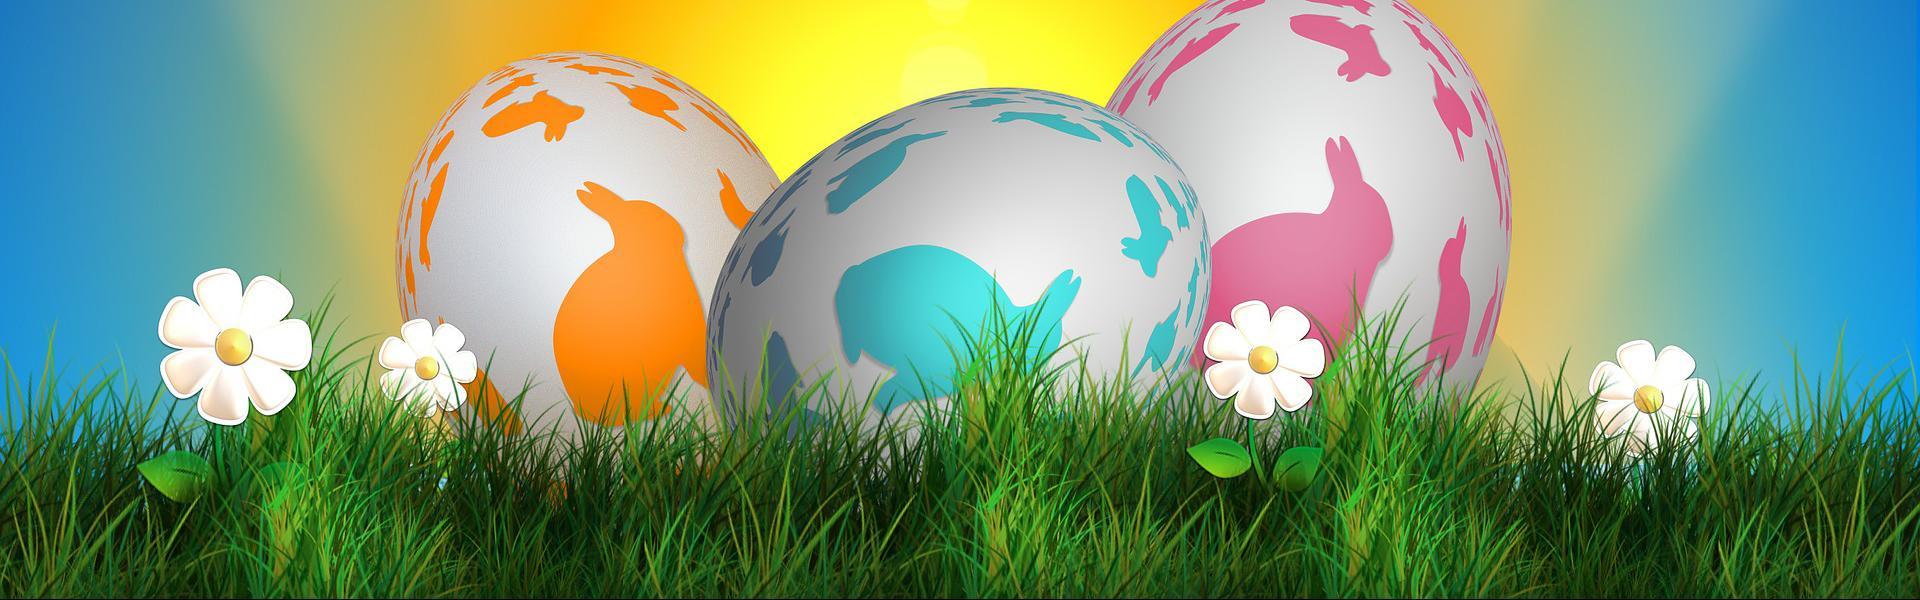 Faccine Pasquali - Easter Emoticons